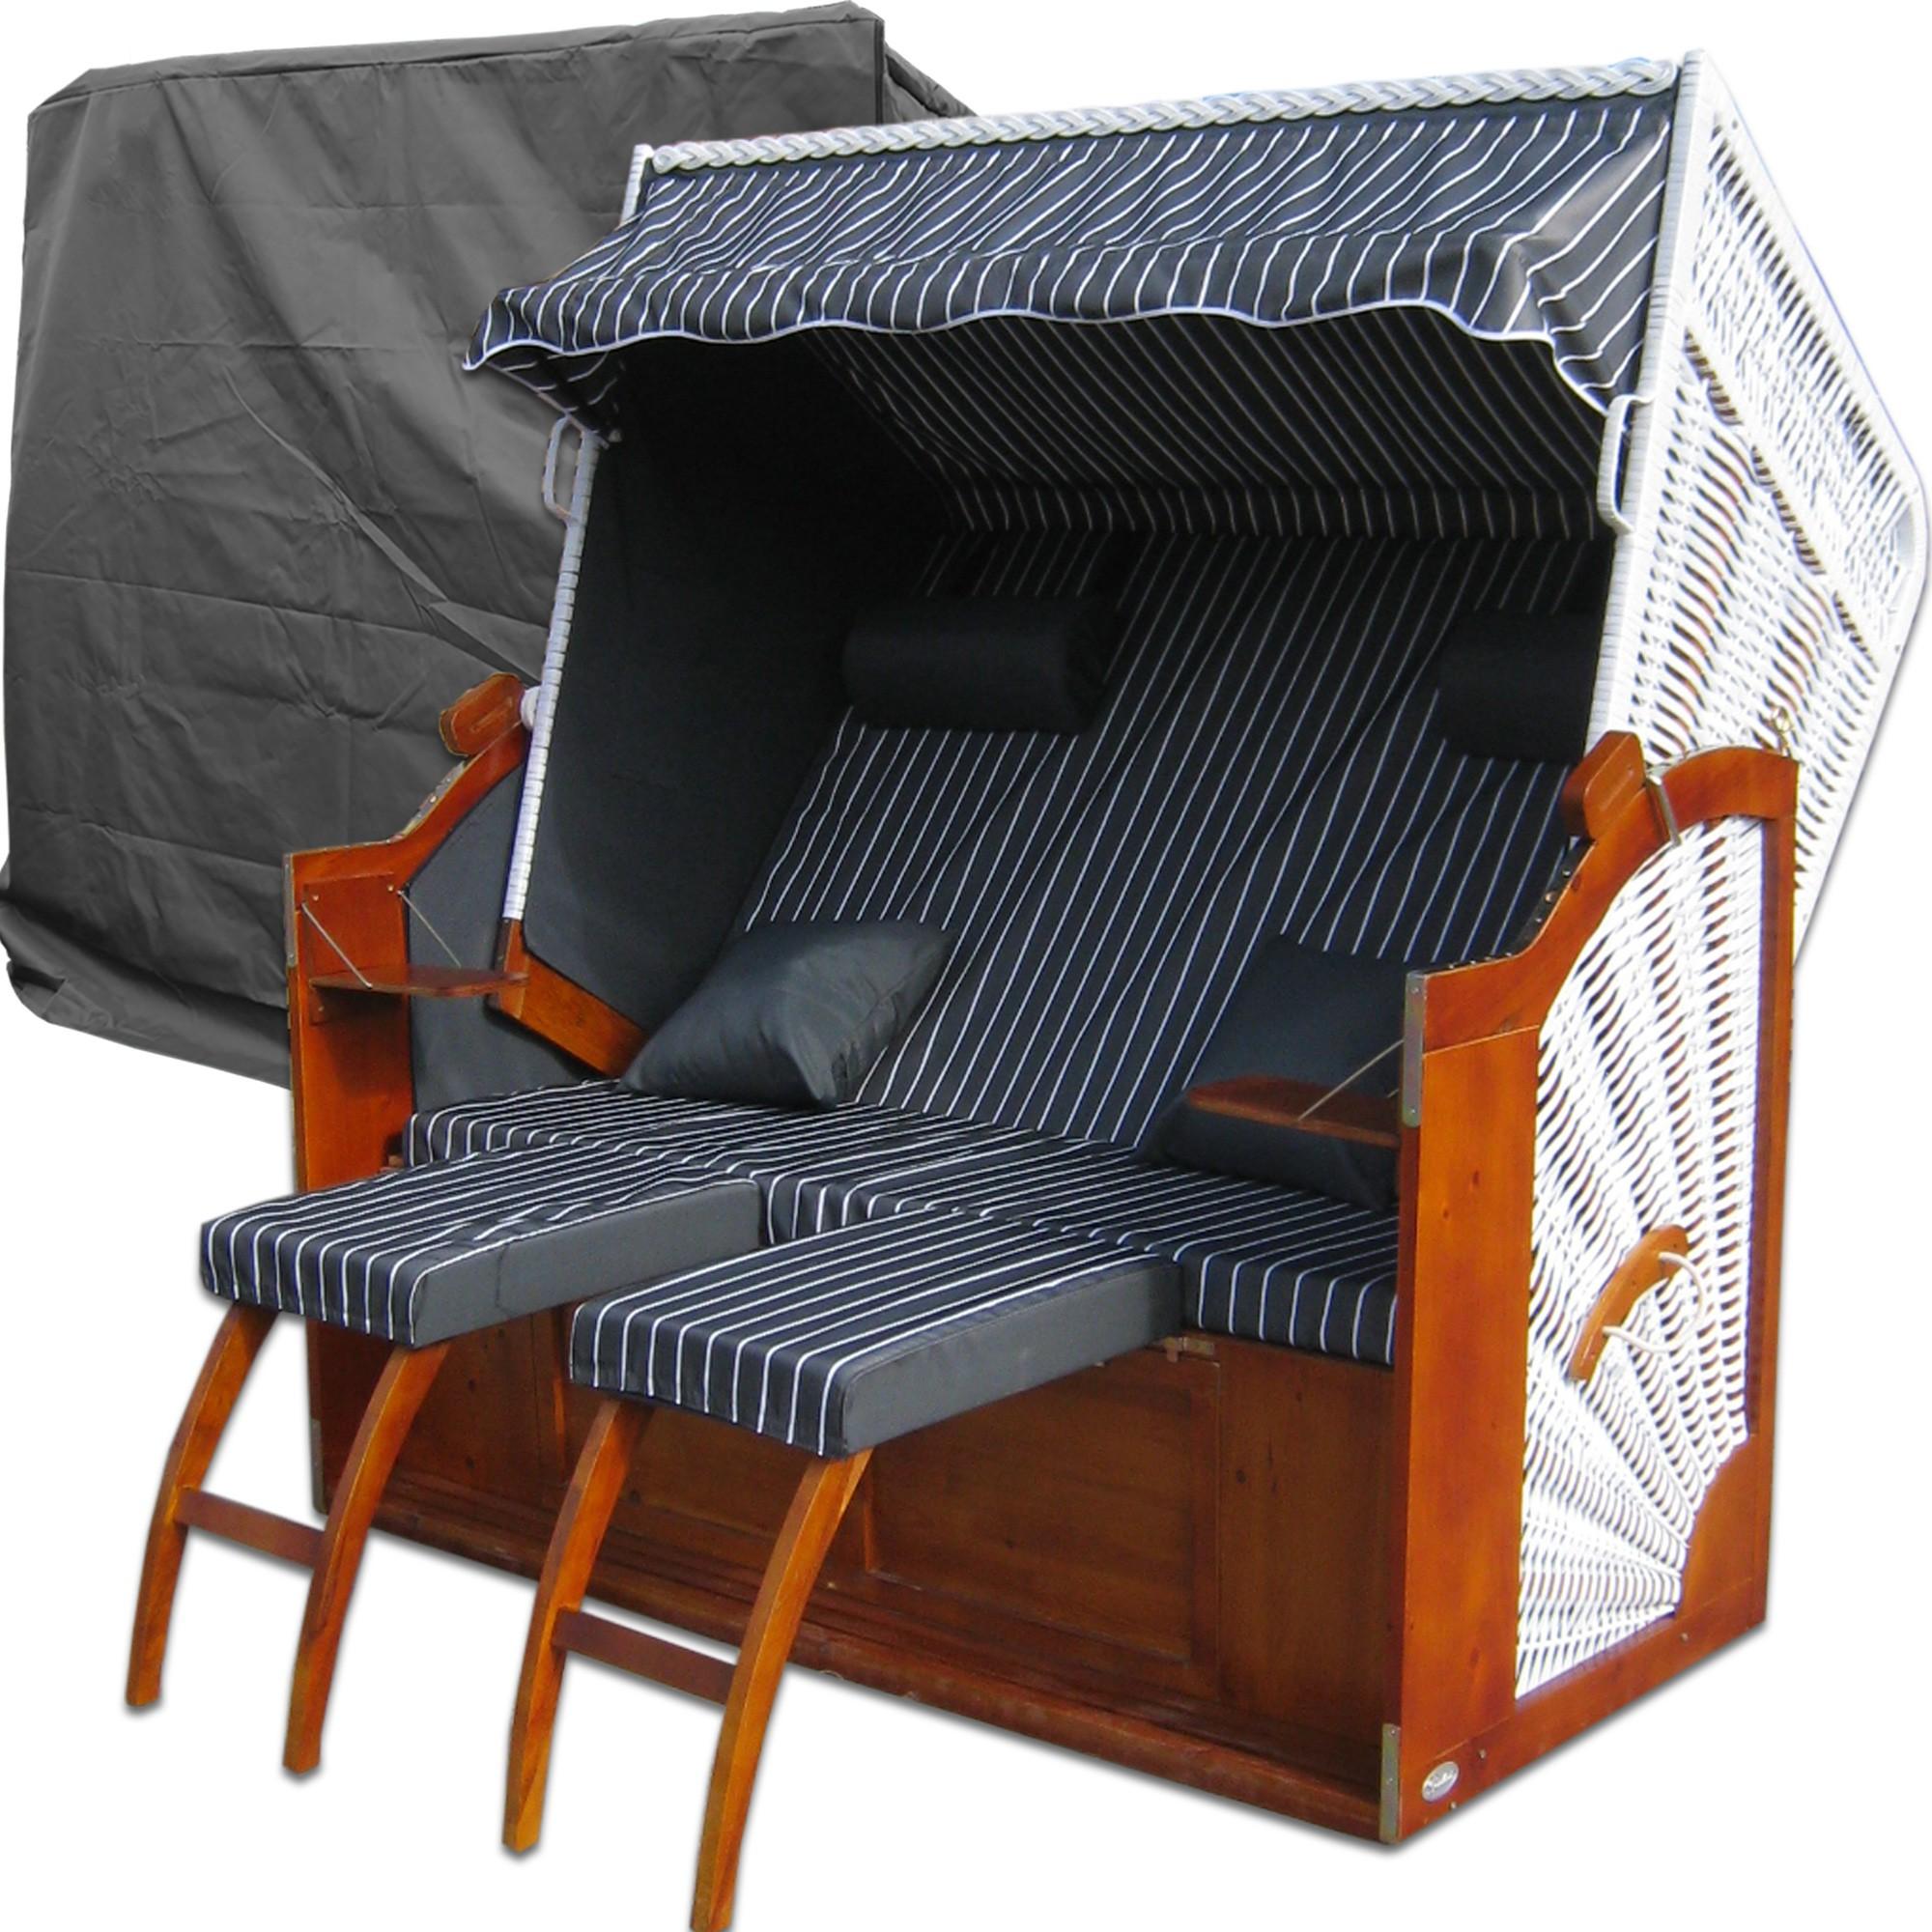 strandkorb ostsee kaufen strandkorb xxl kaufen. Black Bedroom Furniture Sets. Home Design Ideas